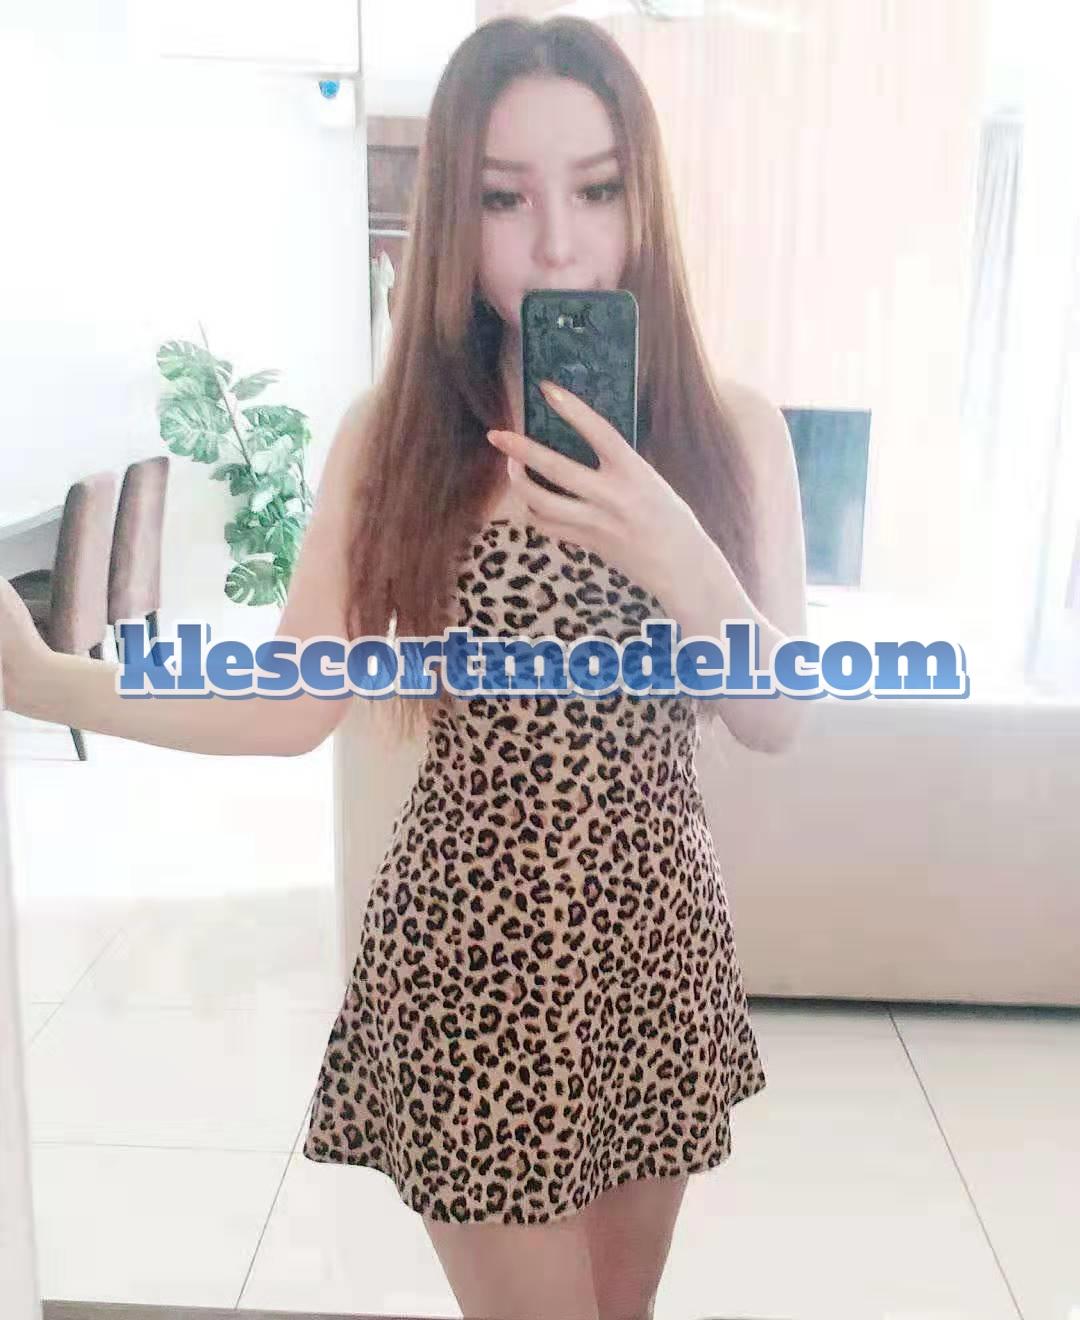 Korea Escort Girl - Malaysia Escort - Kate - Klescortmodel.com